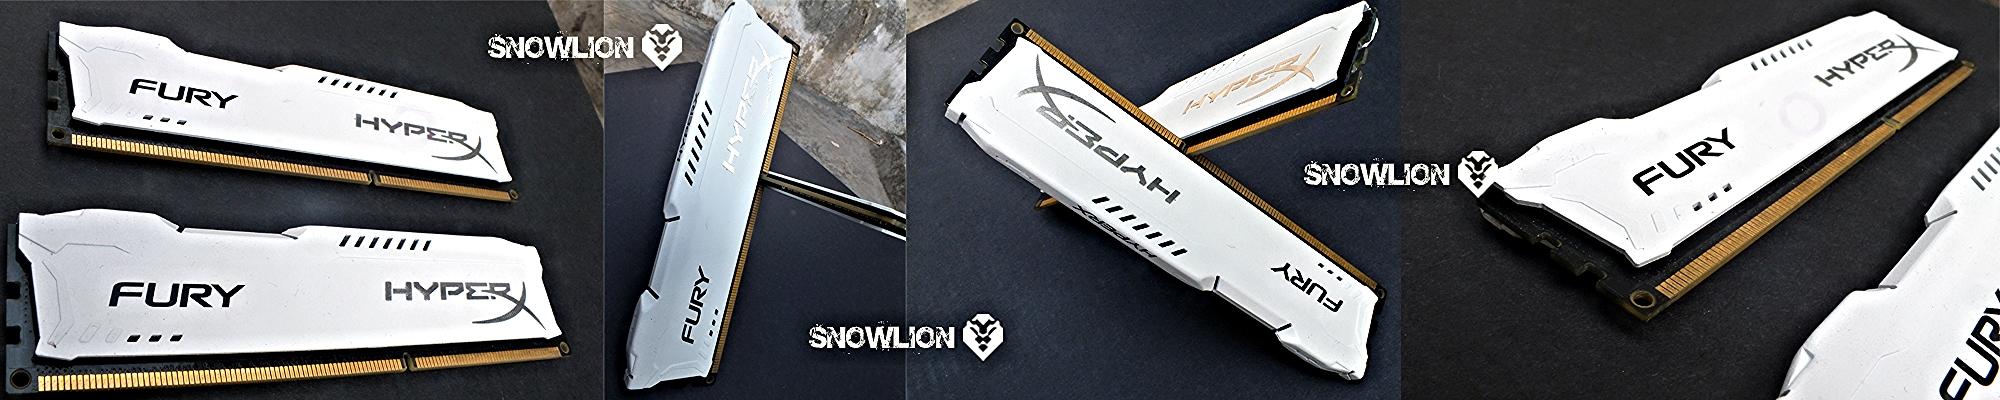 snowlion68